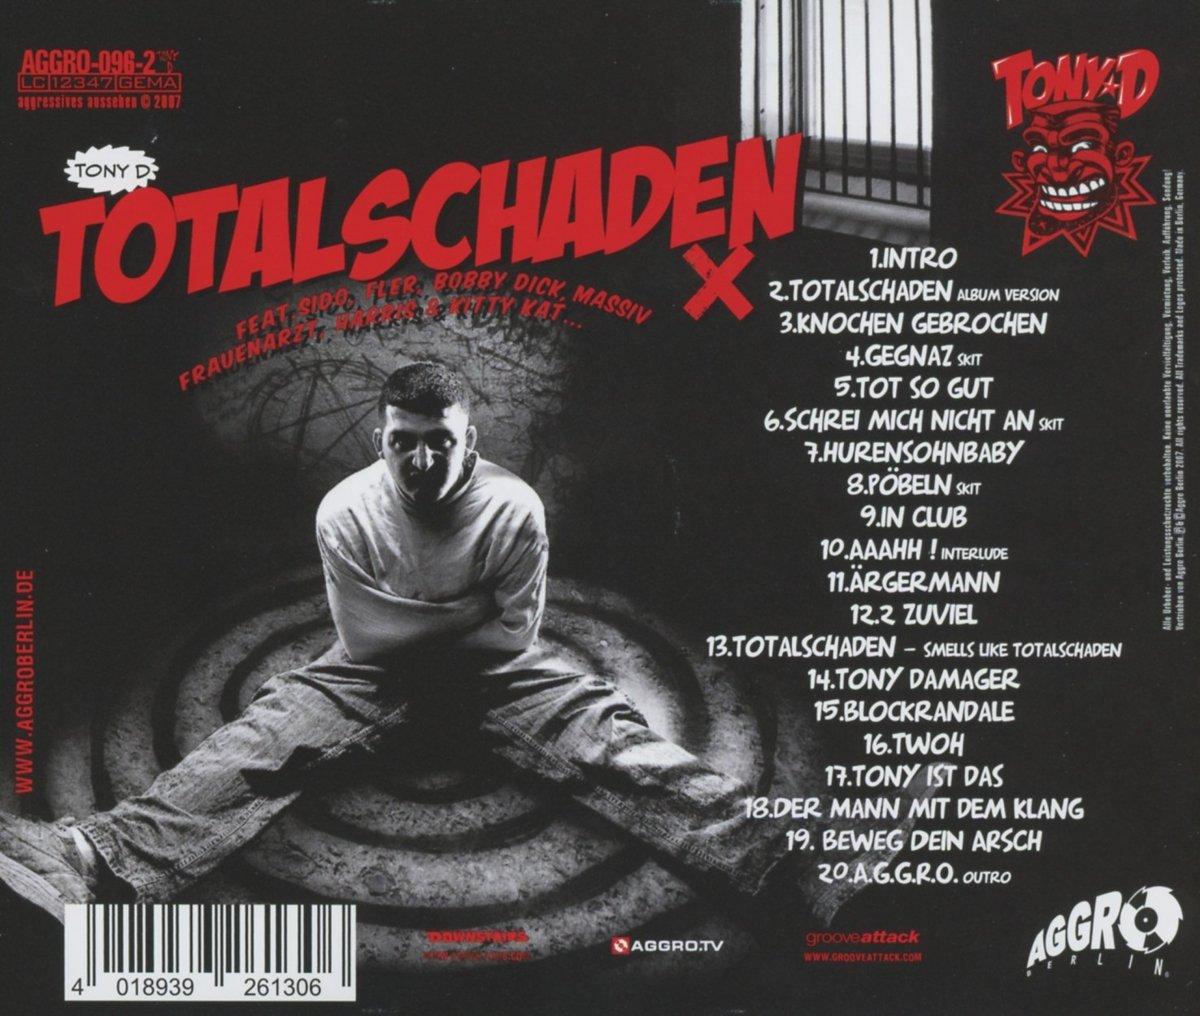 tony d totalschaden album